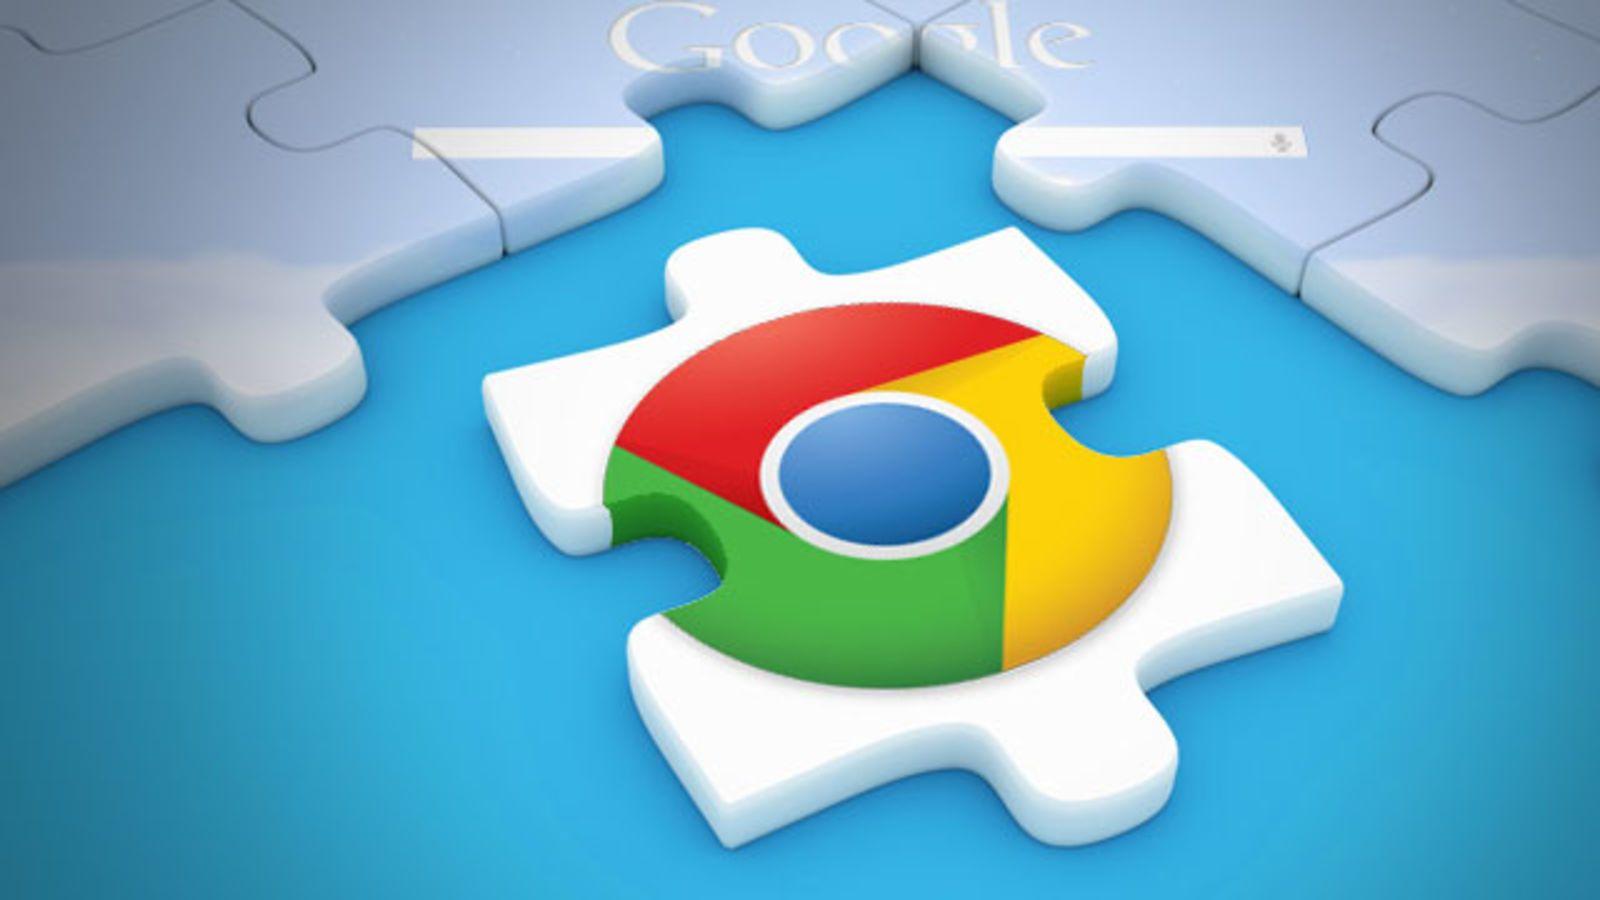 1836355edd07e3bbe1c869d7c3ca58b5 - How To Use Hola Vpn On Chrome